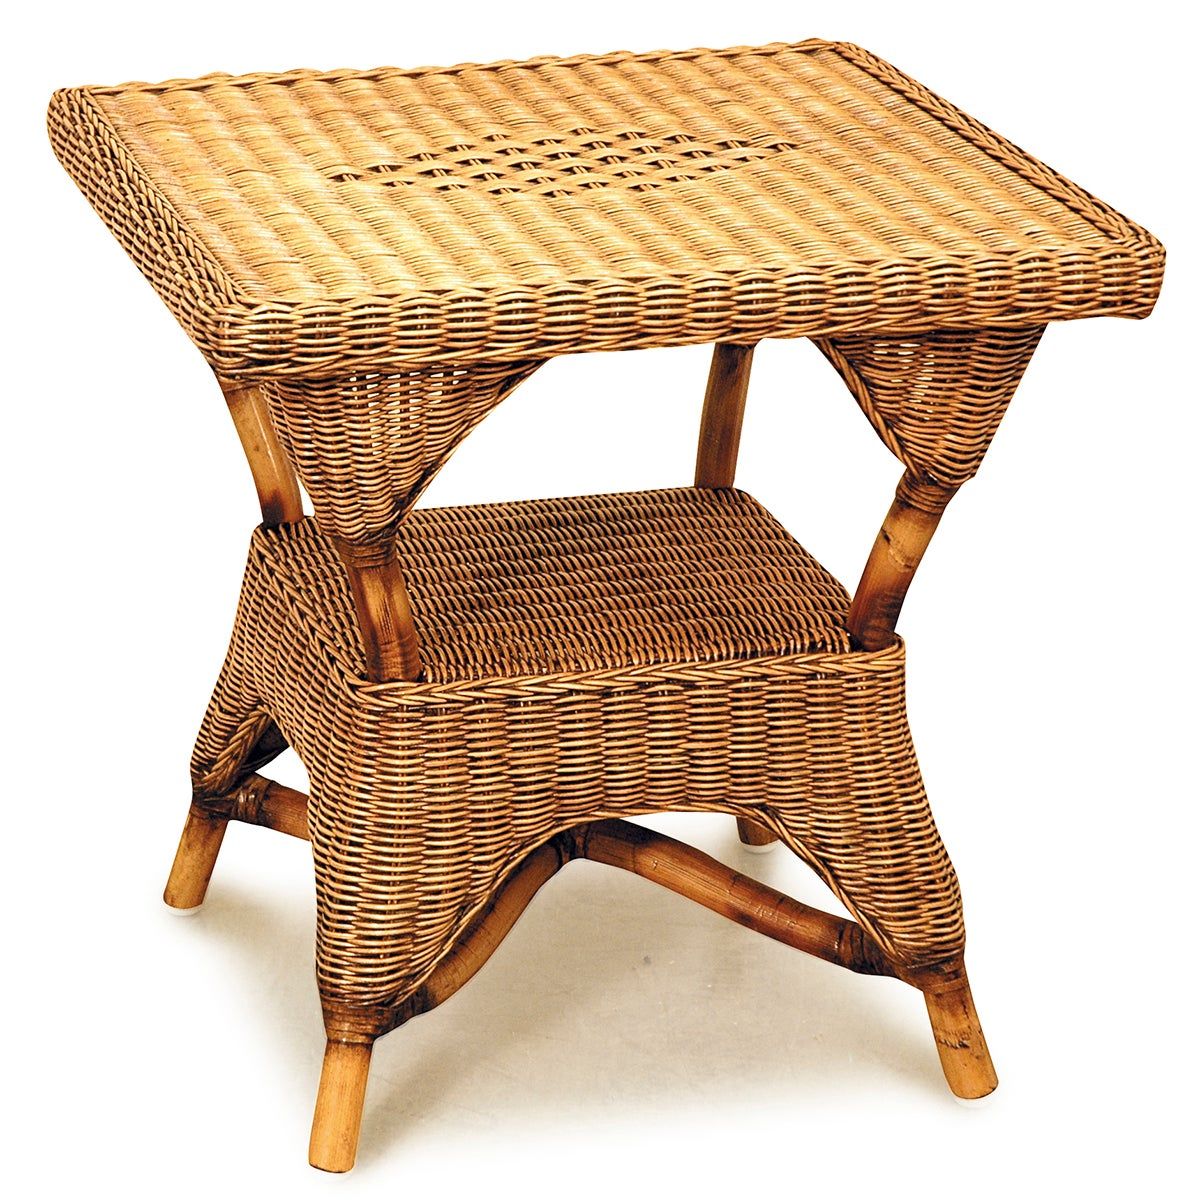 Bermuda Cane Square Side Table in Brown